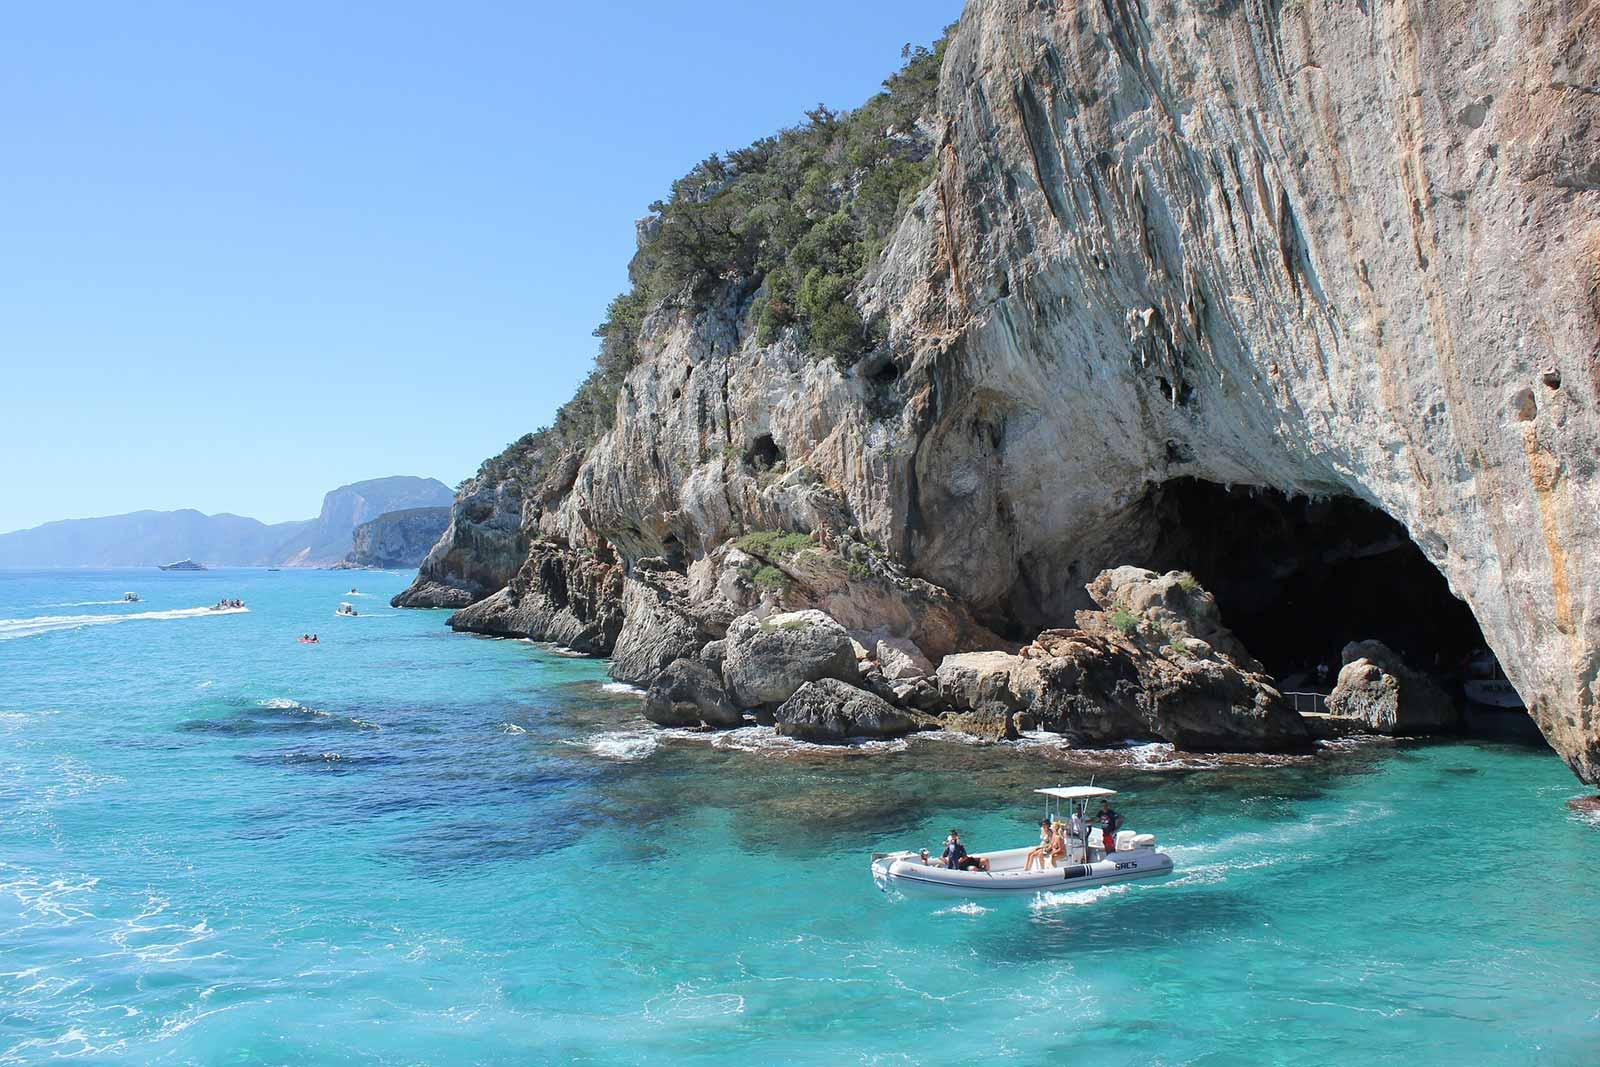 RIB-Boot-mieten-Mallorca-Wassersport-Mallorca-2